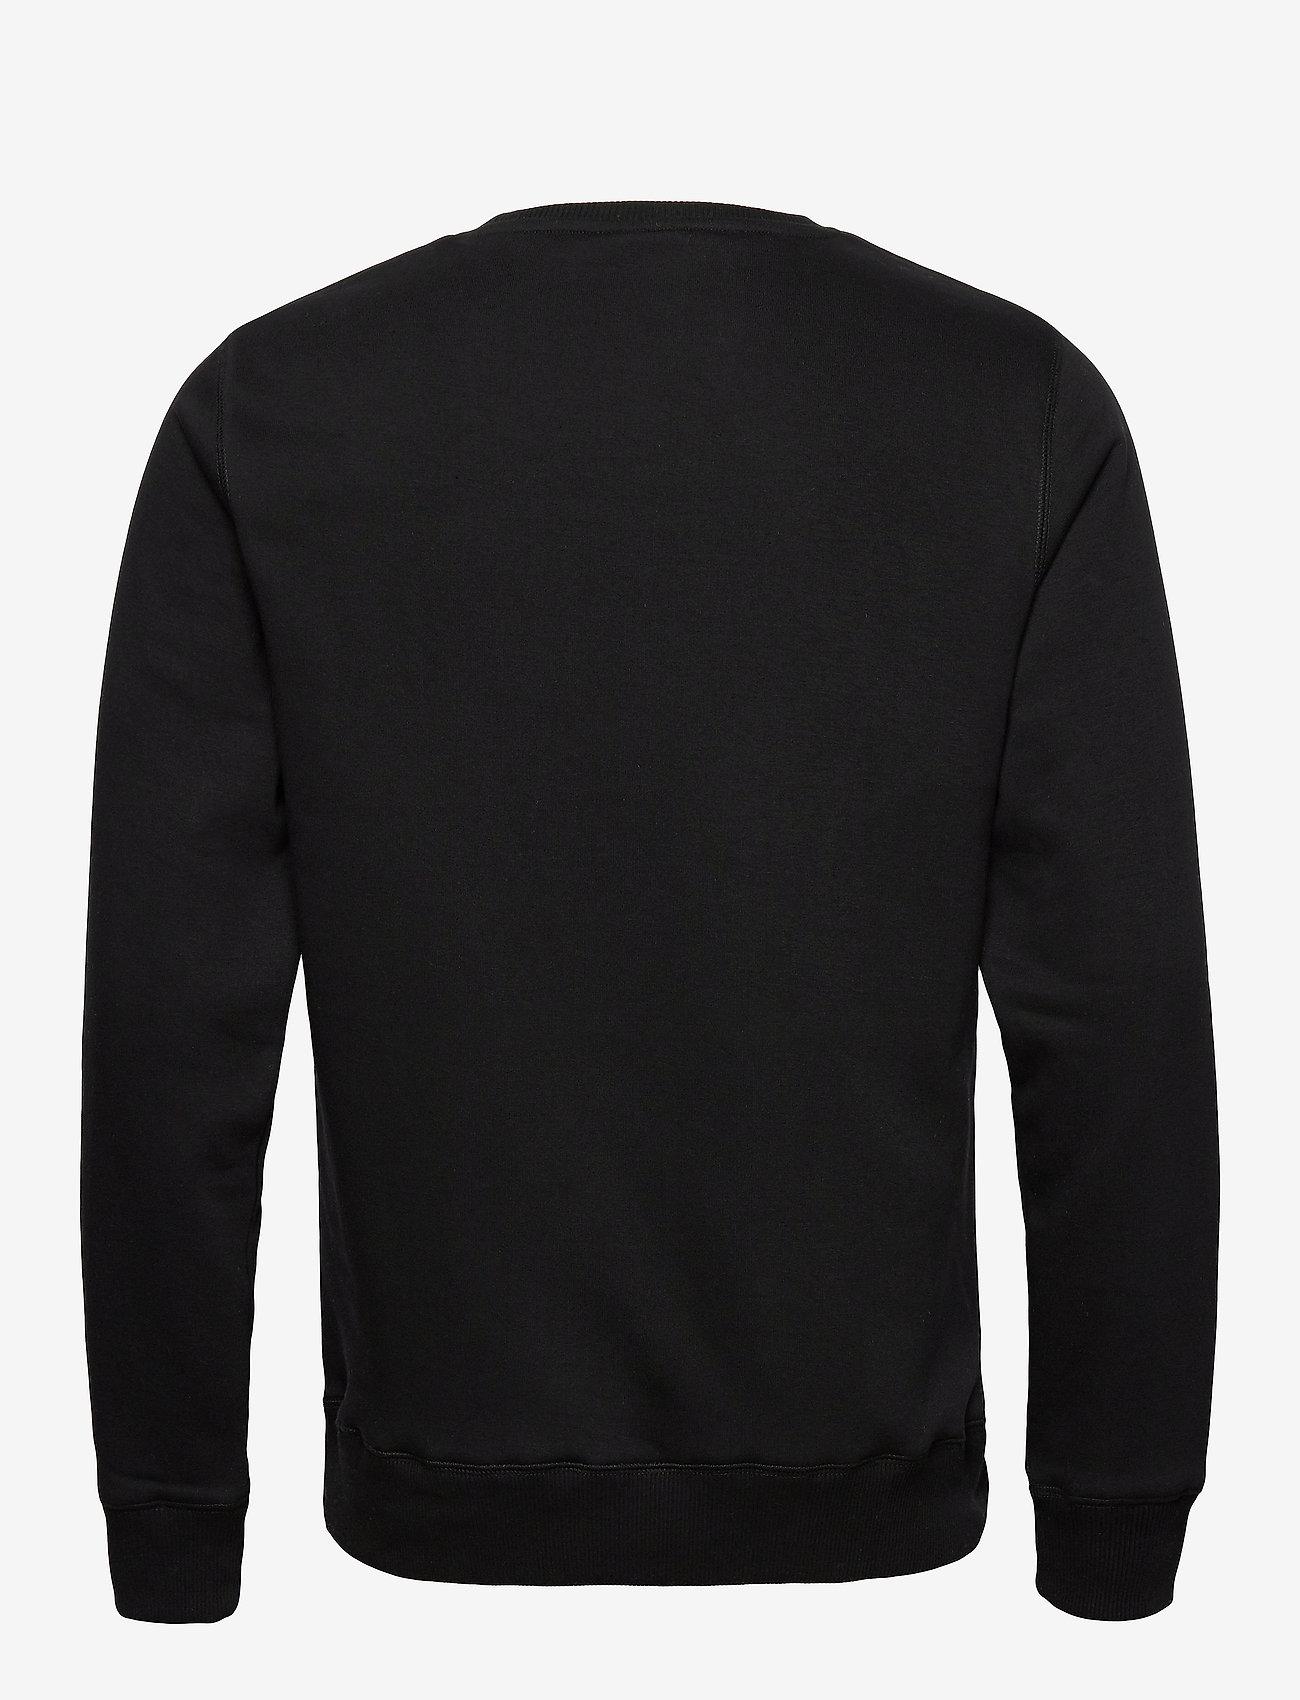 Soulland - LOGIC WILLIE SWEAT W. FRONT FLOCK PRINT - sweatshirts - black - 1